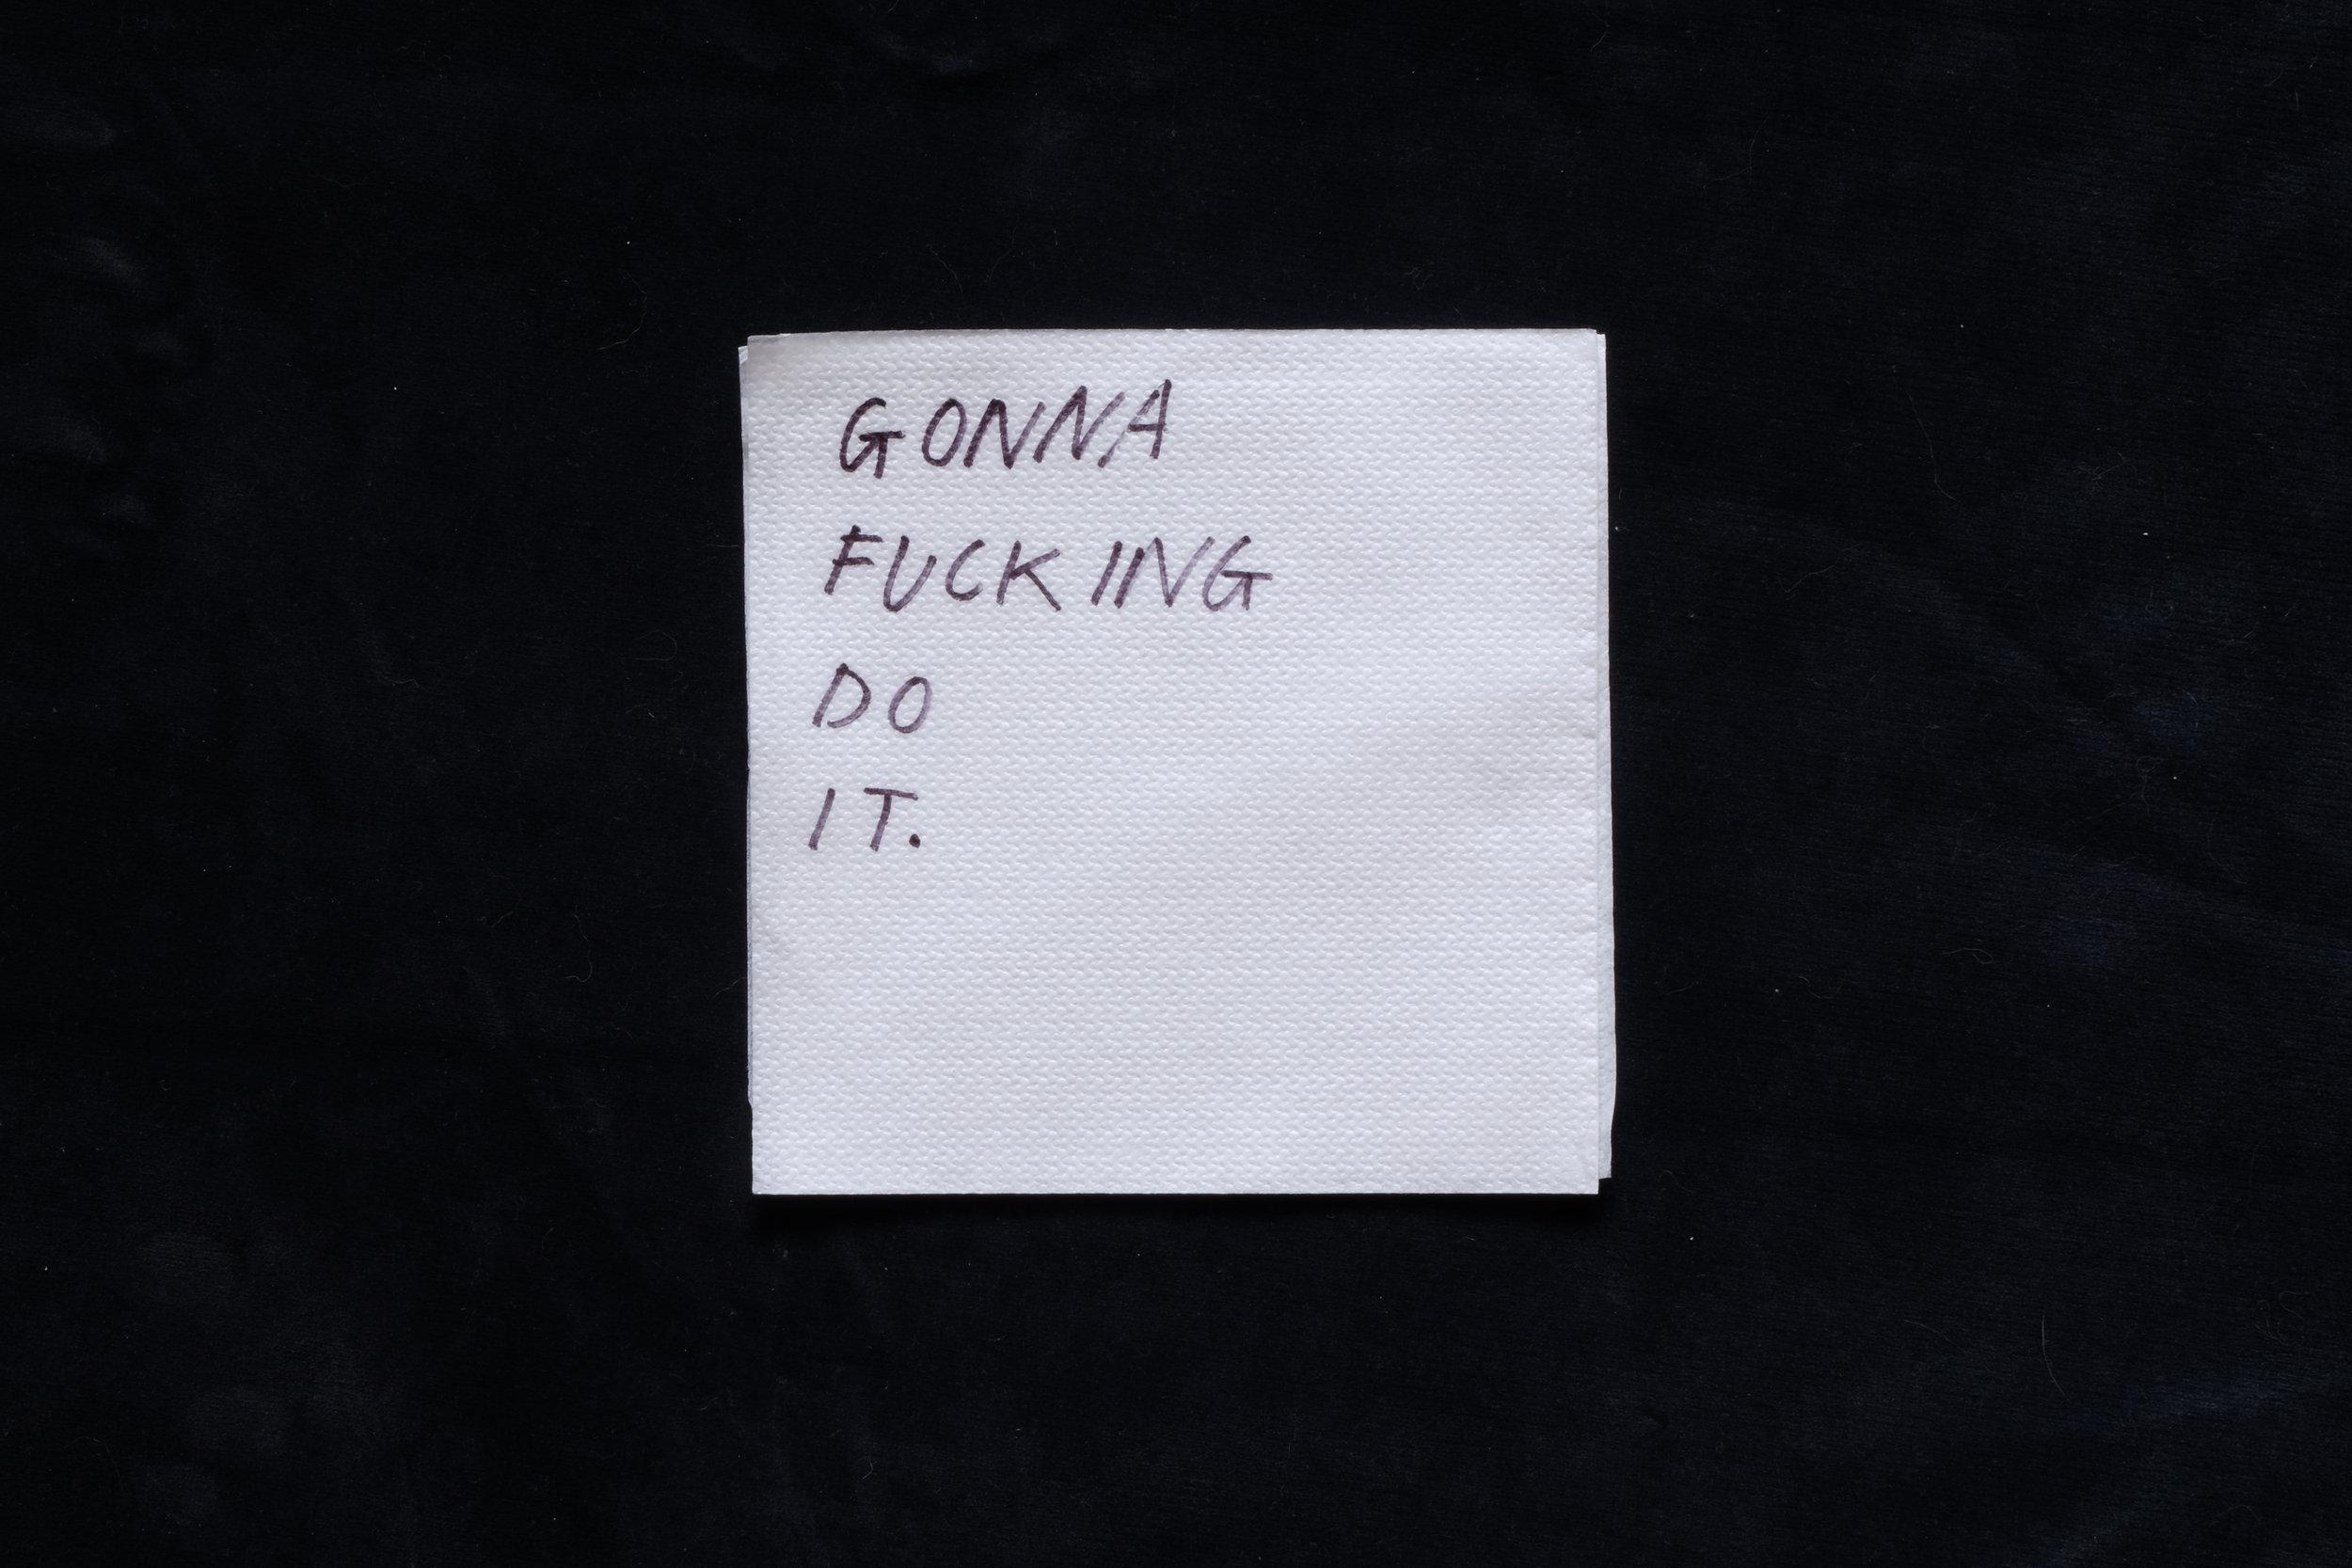 'GFDI'